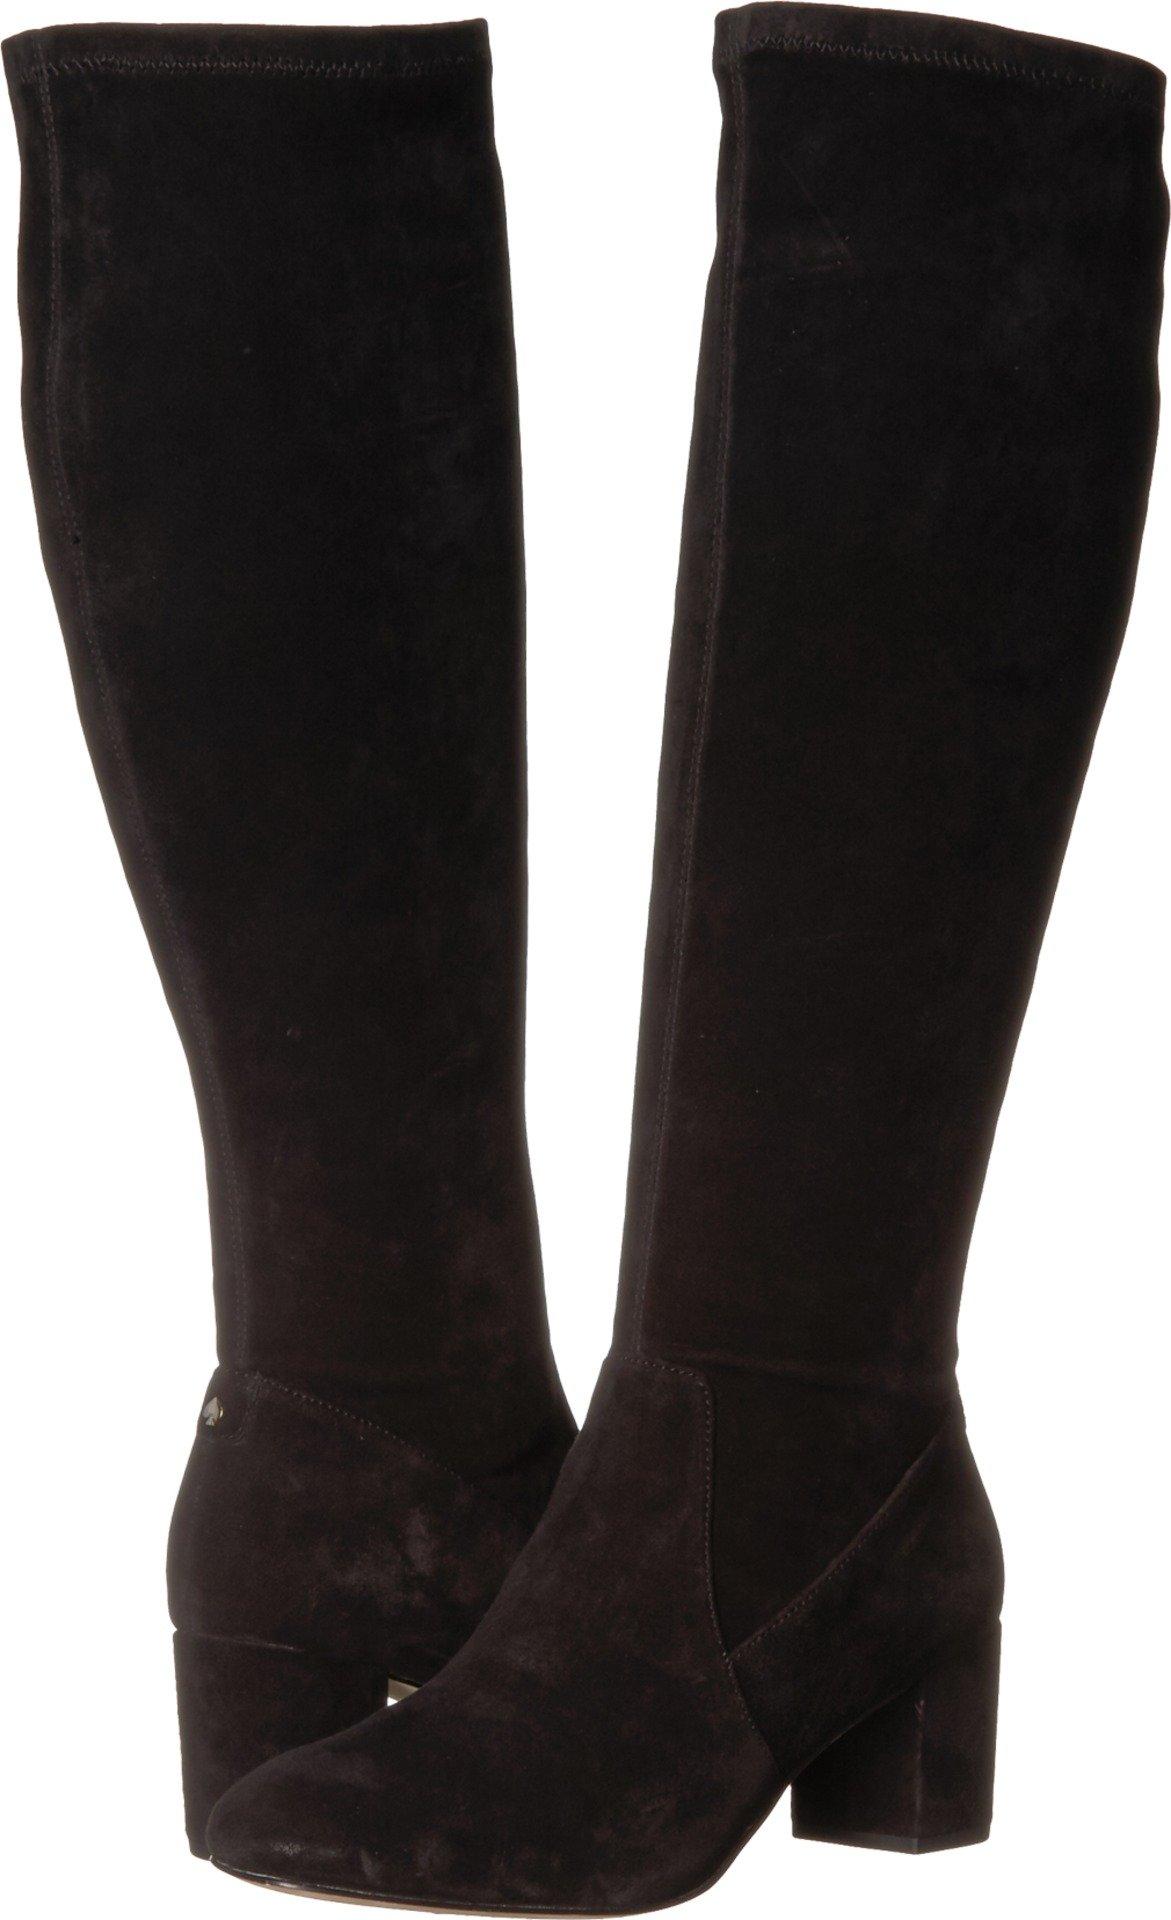 kate spade new york Women's Leanne Fashion Boot, Black, 8 M US